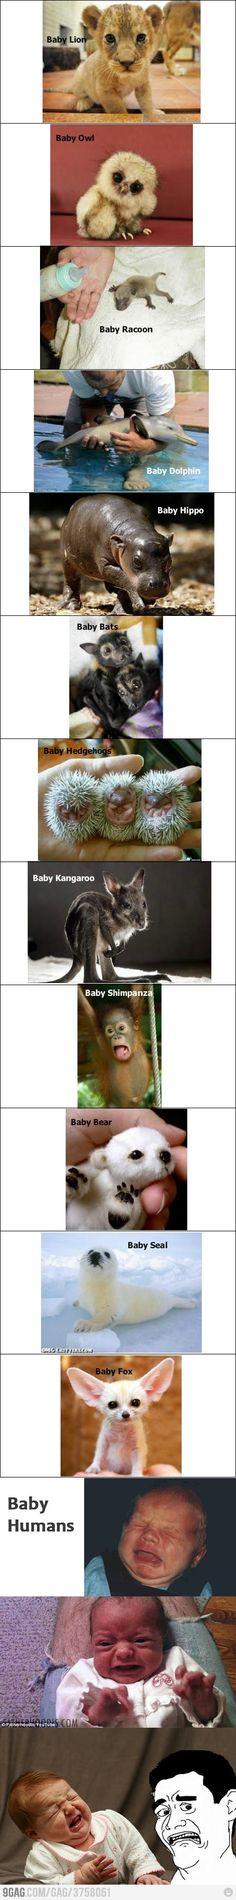 Hahahahahh God! You did something terribly Wrong!